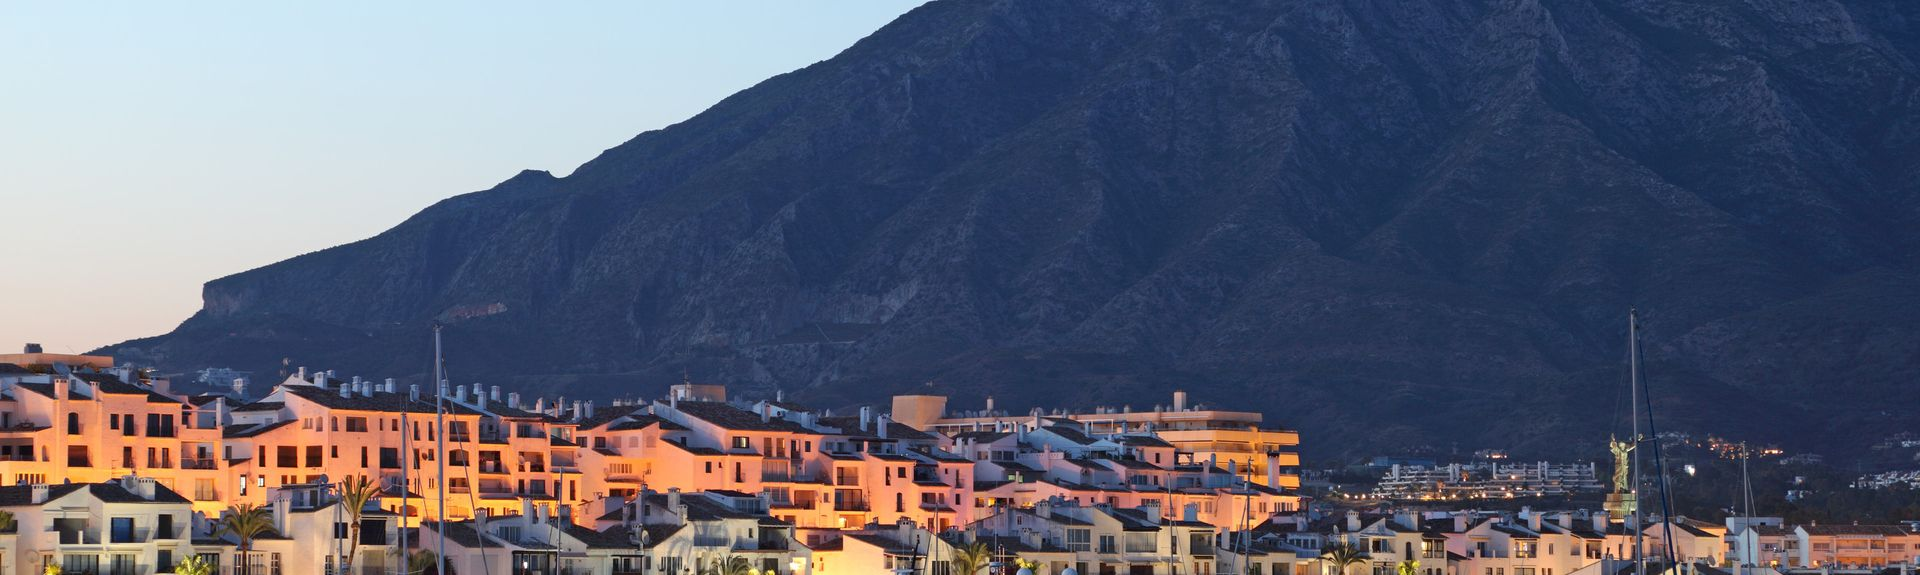 Playa Puerto Banús, Marbella, Andalusië, Spanje